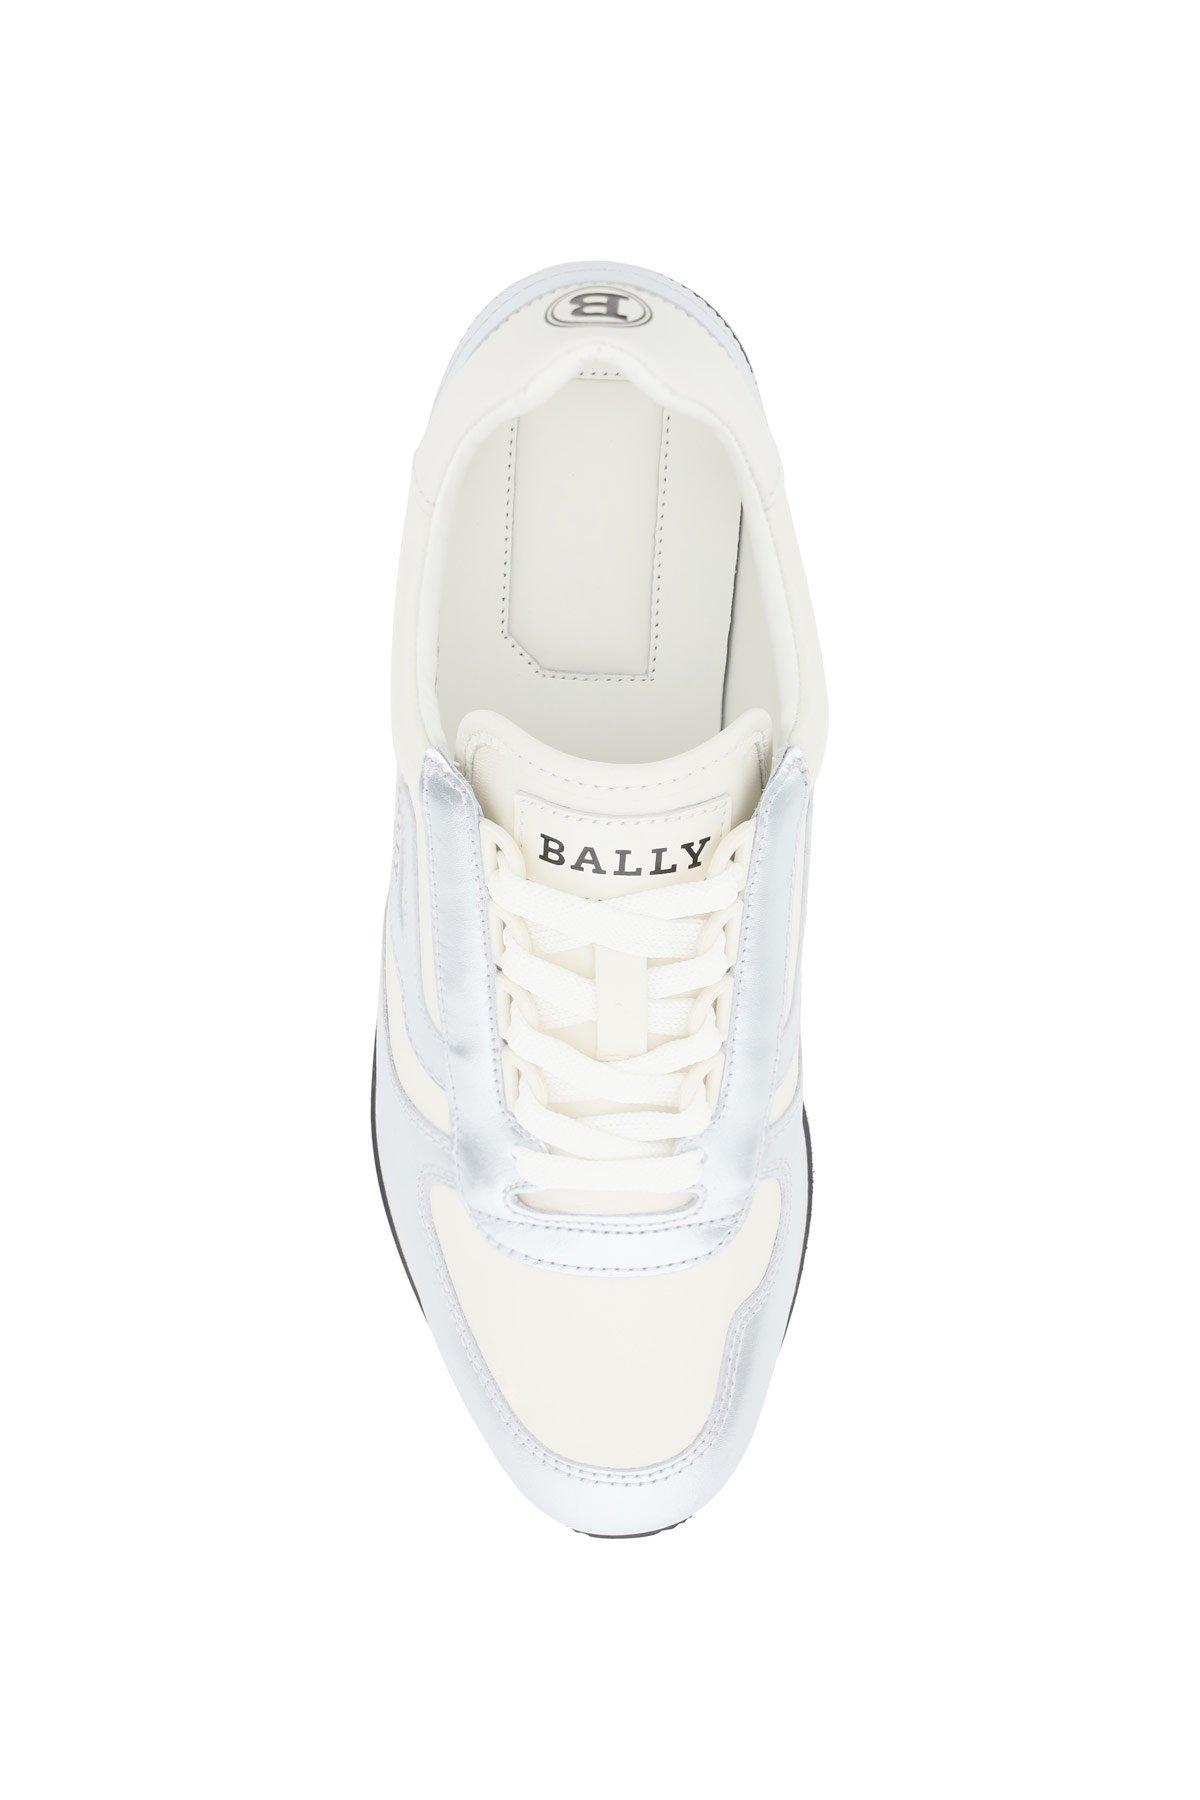 Bally sneakers  gavinia